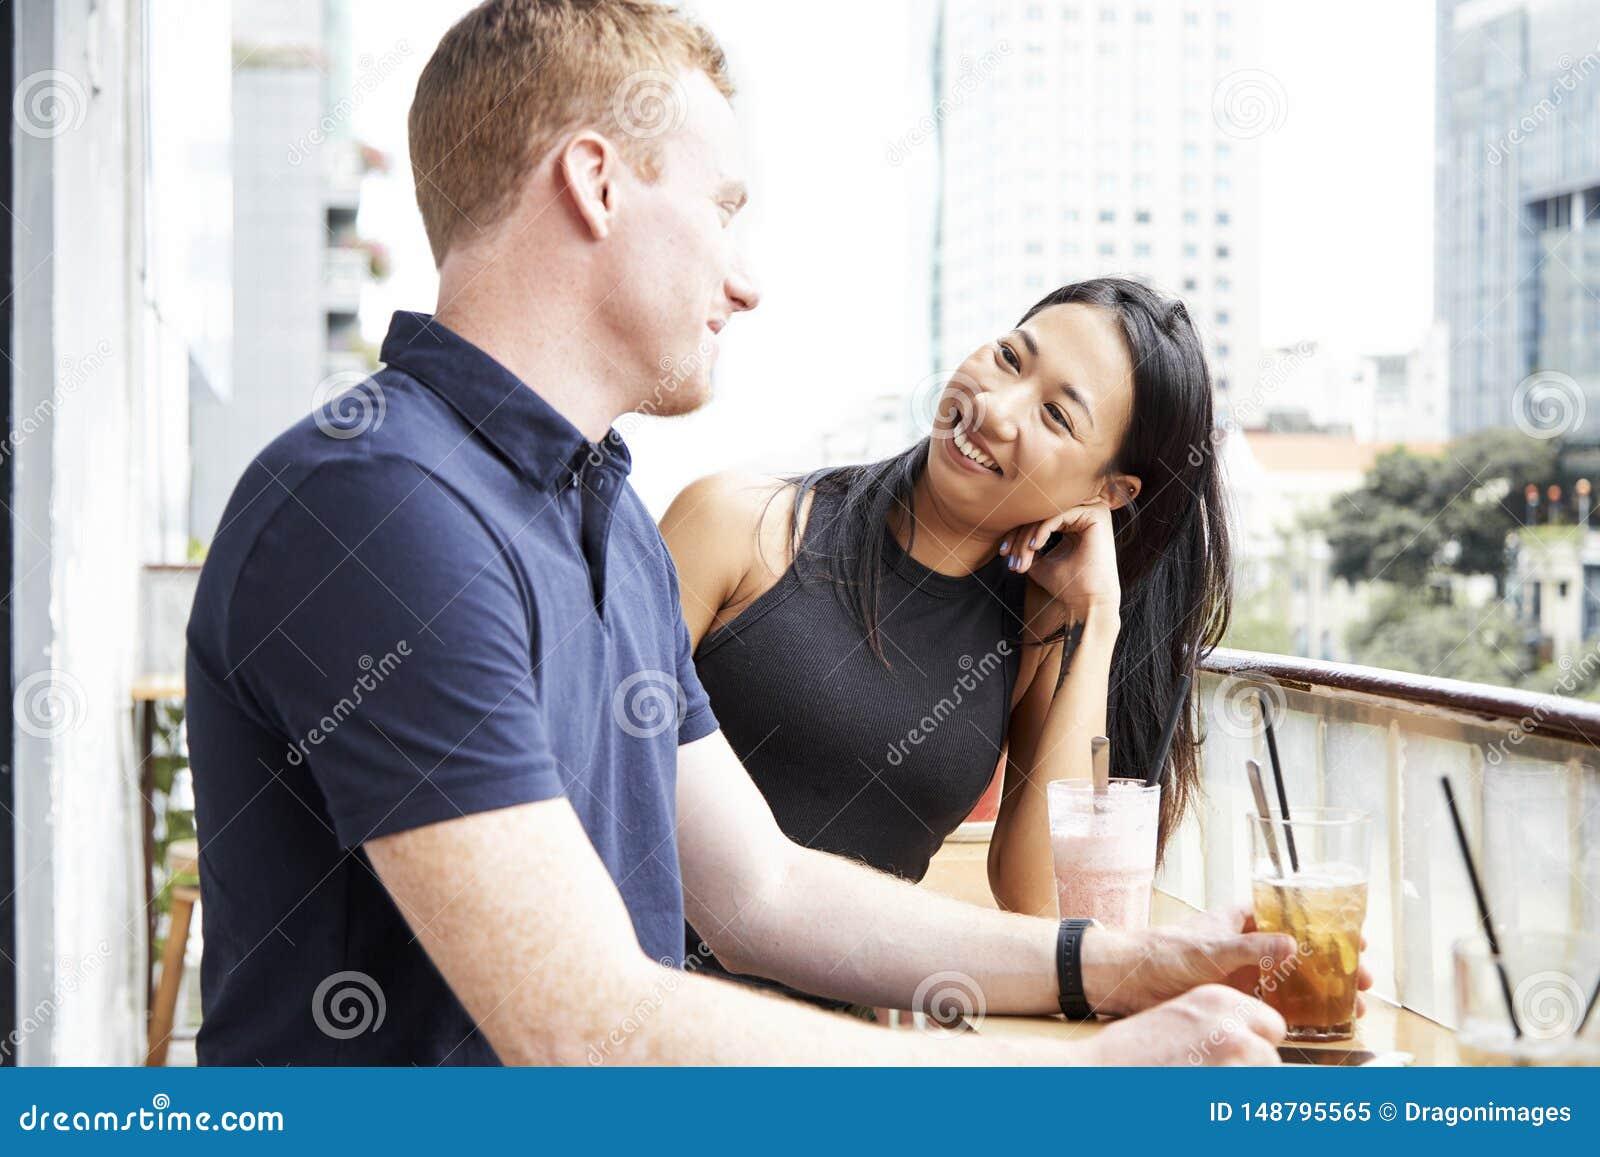 METISSE MAN DATING SITE